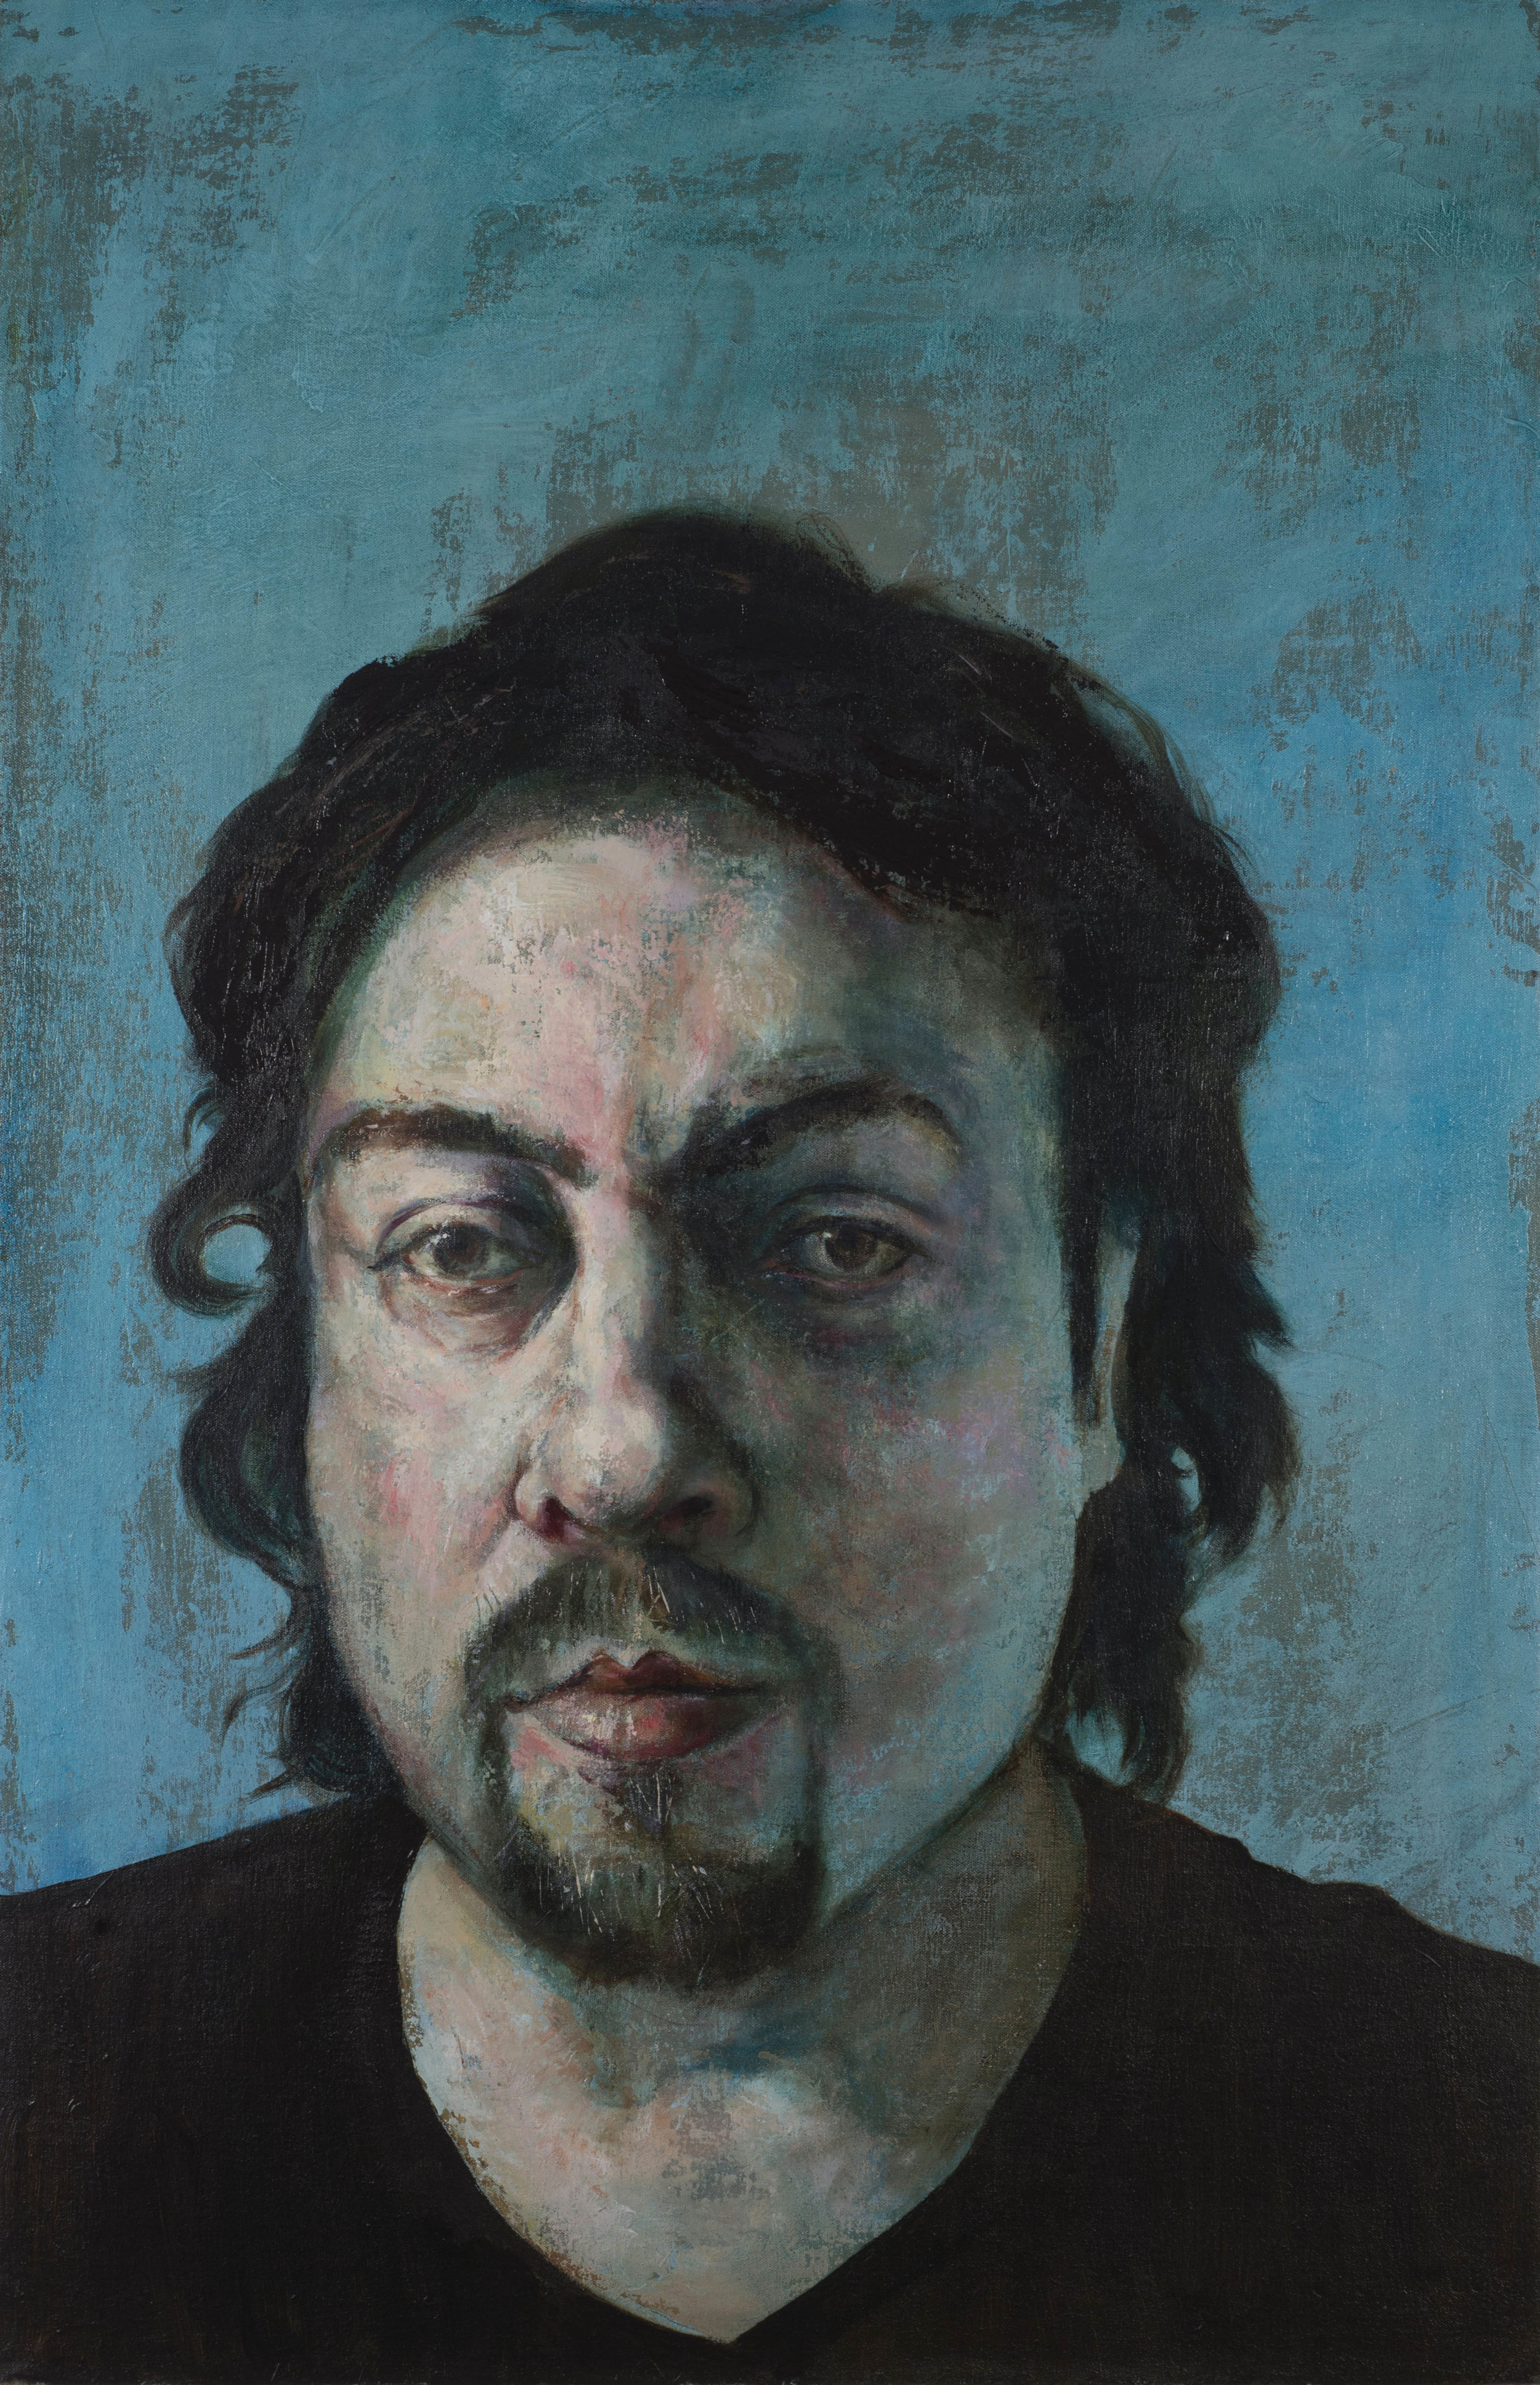 SPA 2017 Exhibition, Distant Relative,66 x 97 cm,Oil on canvas,£4,000